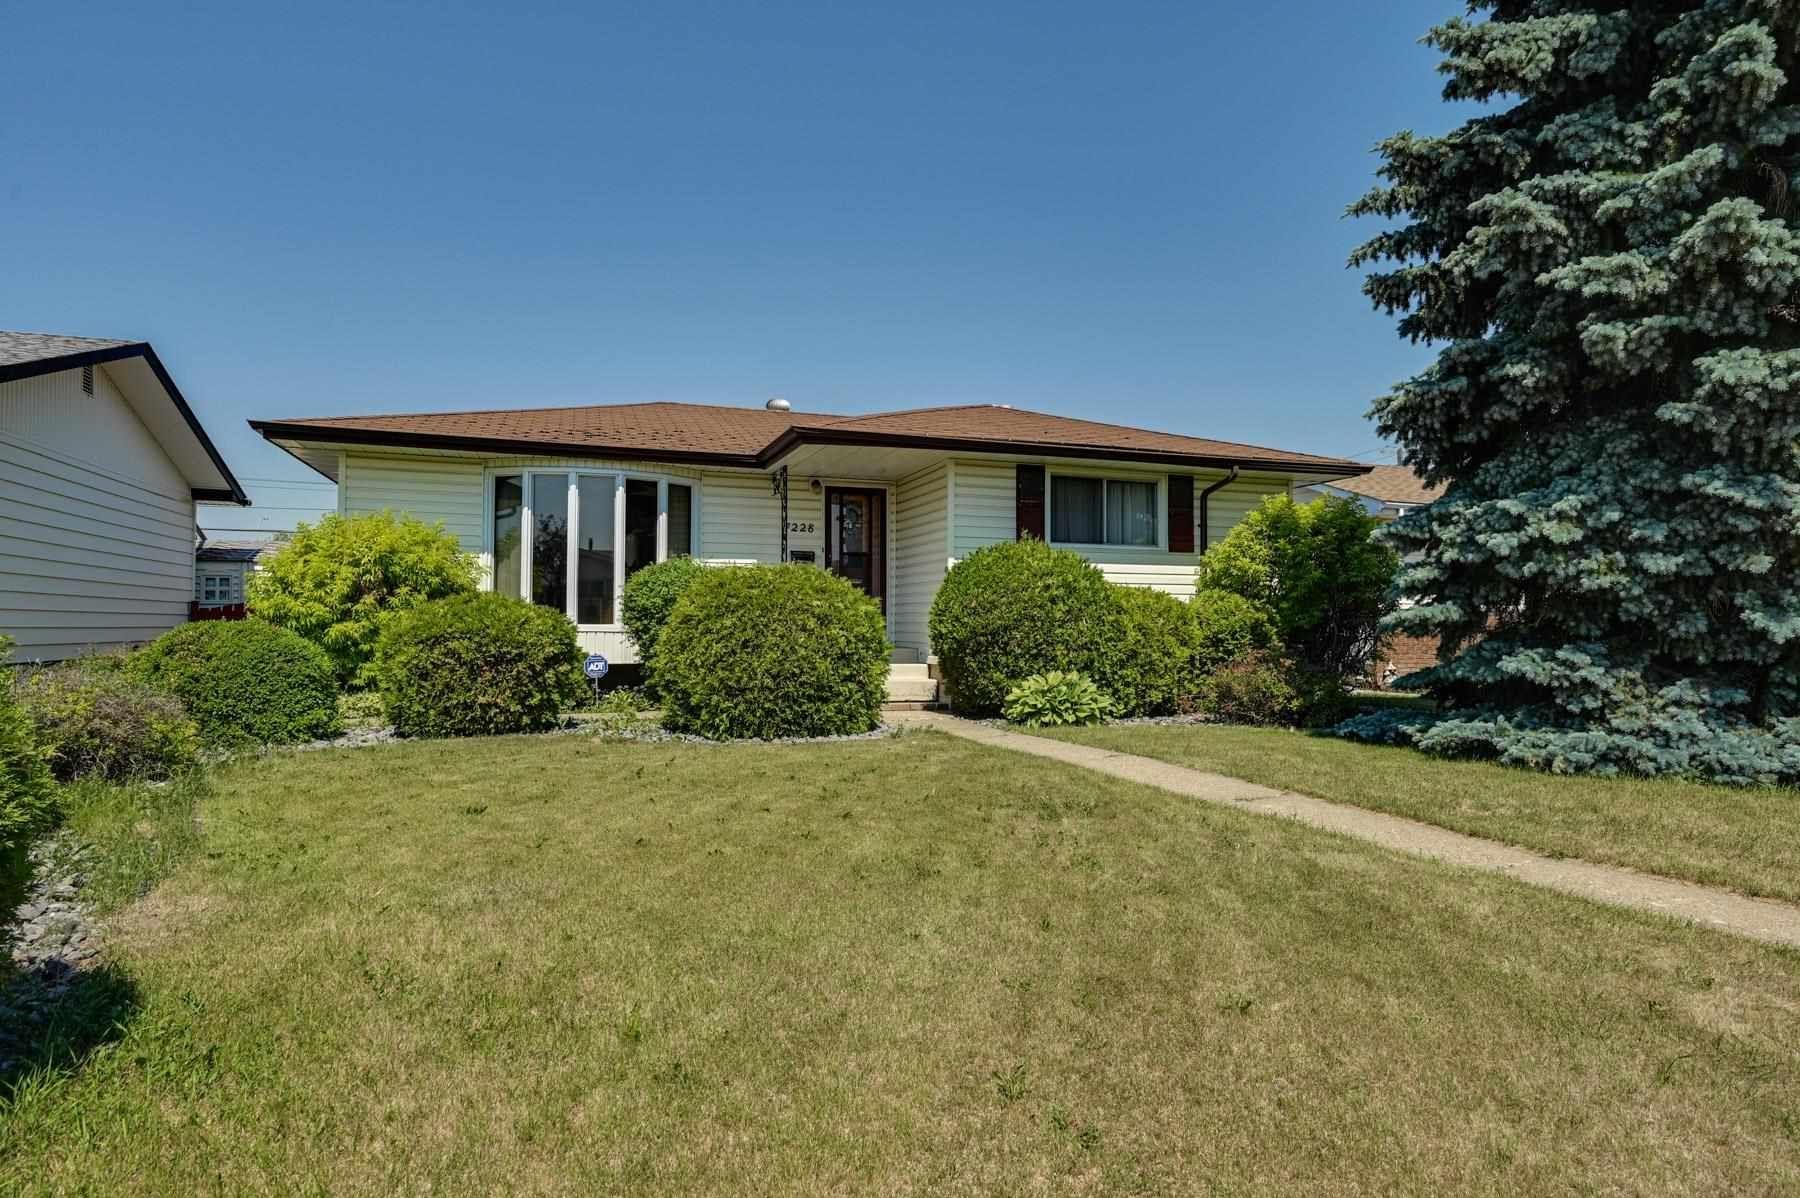 Main Photo: 7228 131A Avenue in Edmonton: Zone 02 House for sale : MLS®# E4265805